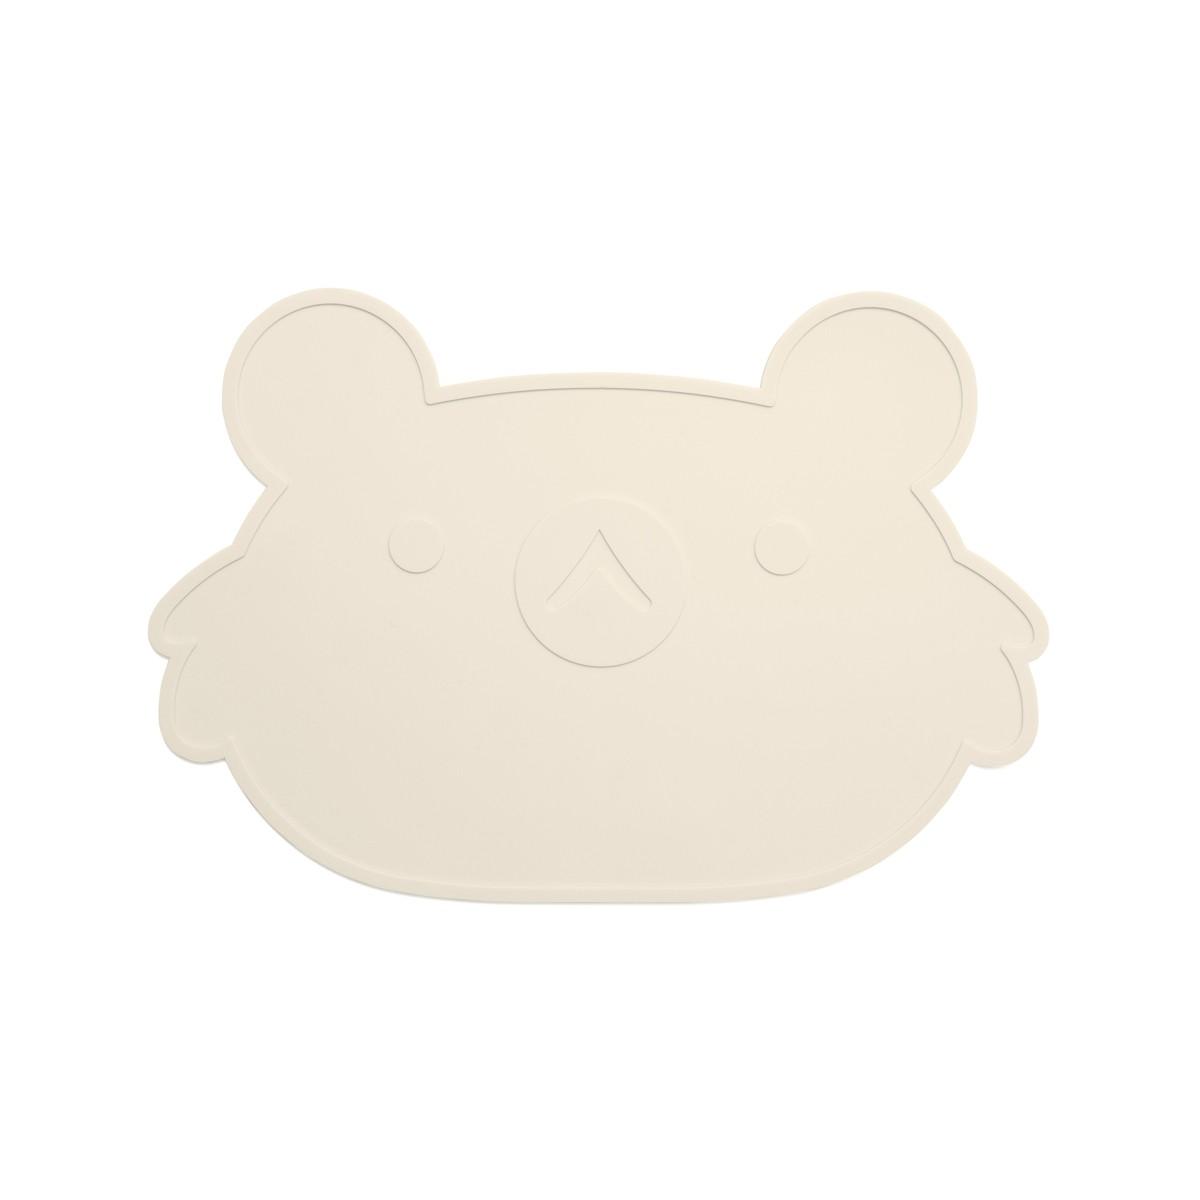 Koala placemat biscuit